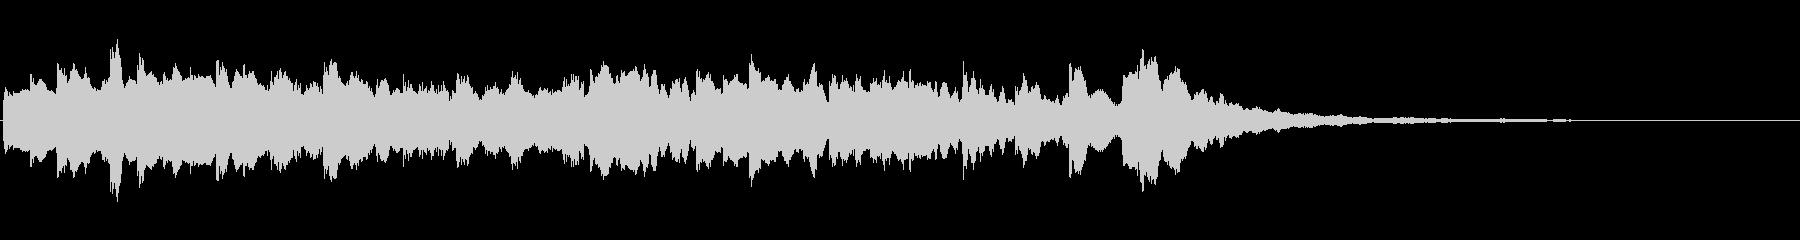 KANT電車発車音系メロディ3の未再生の波形